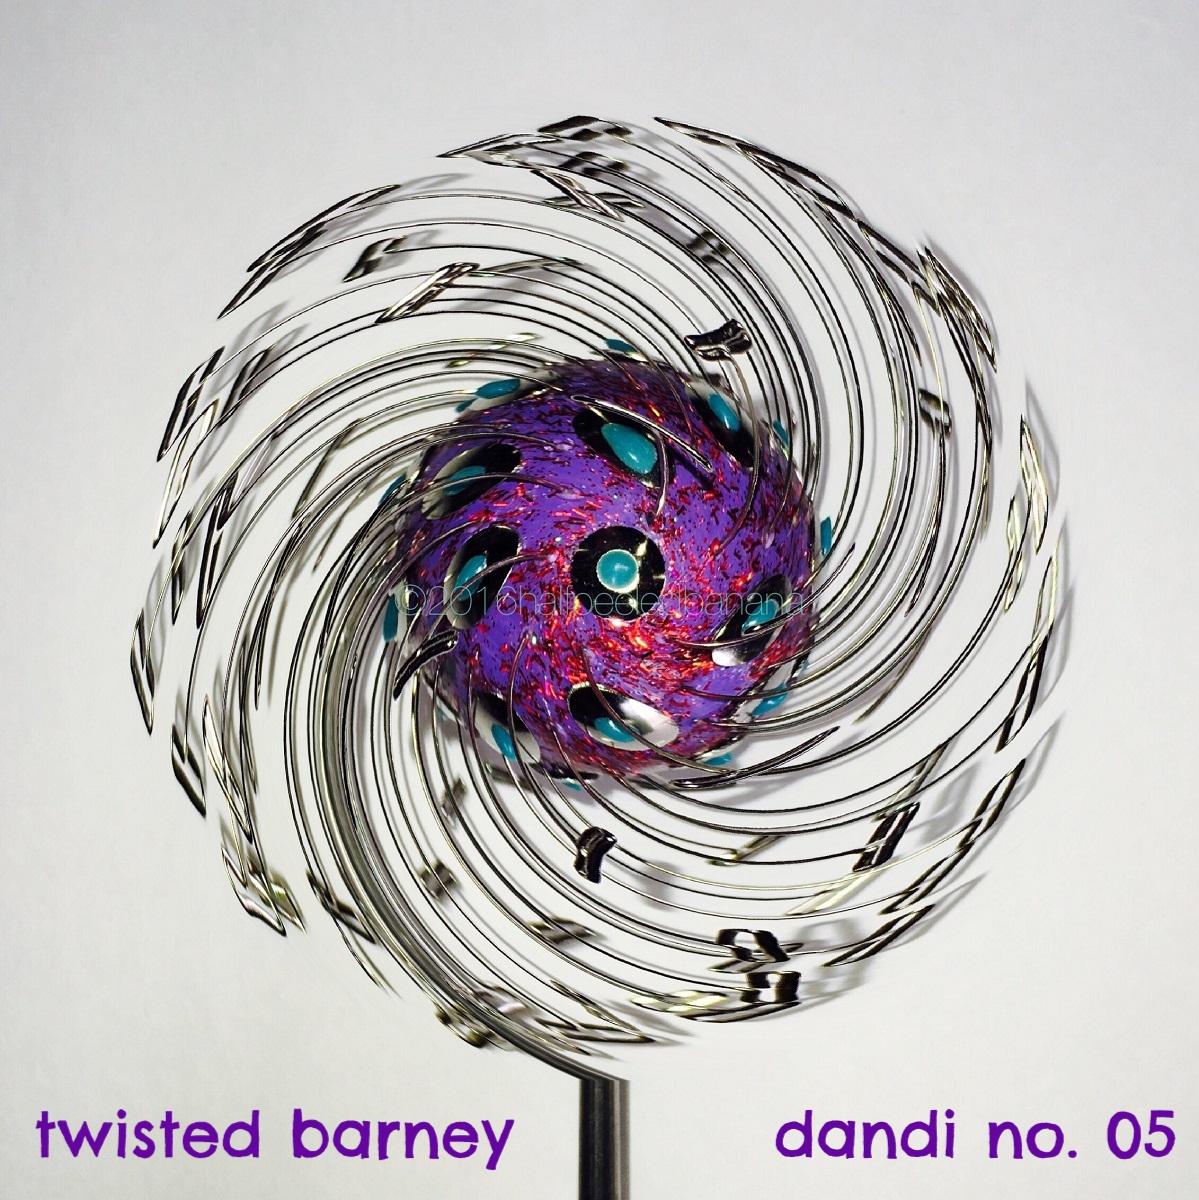 twisted barney